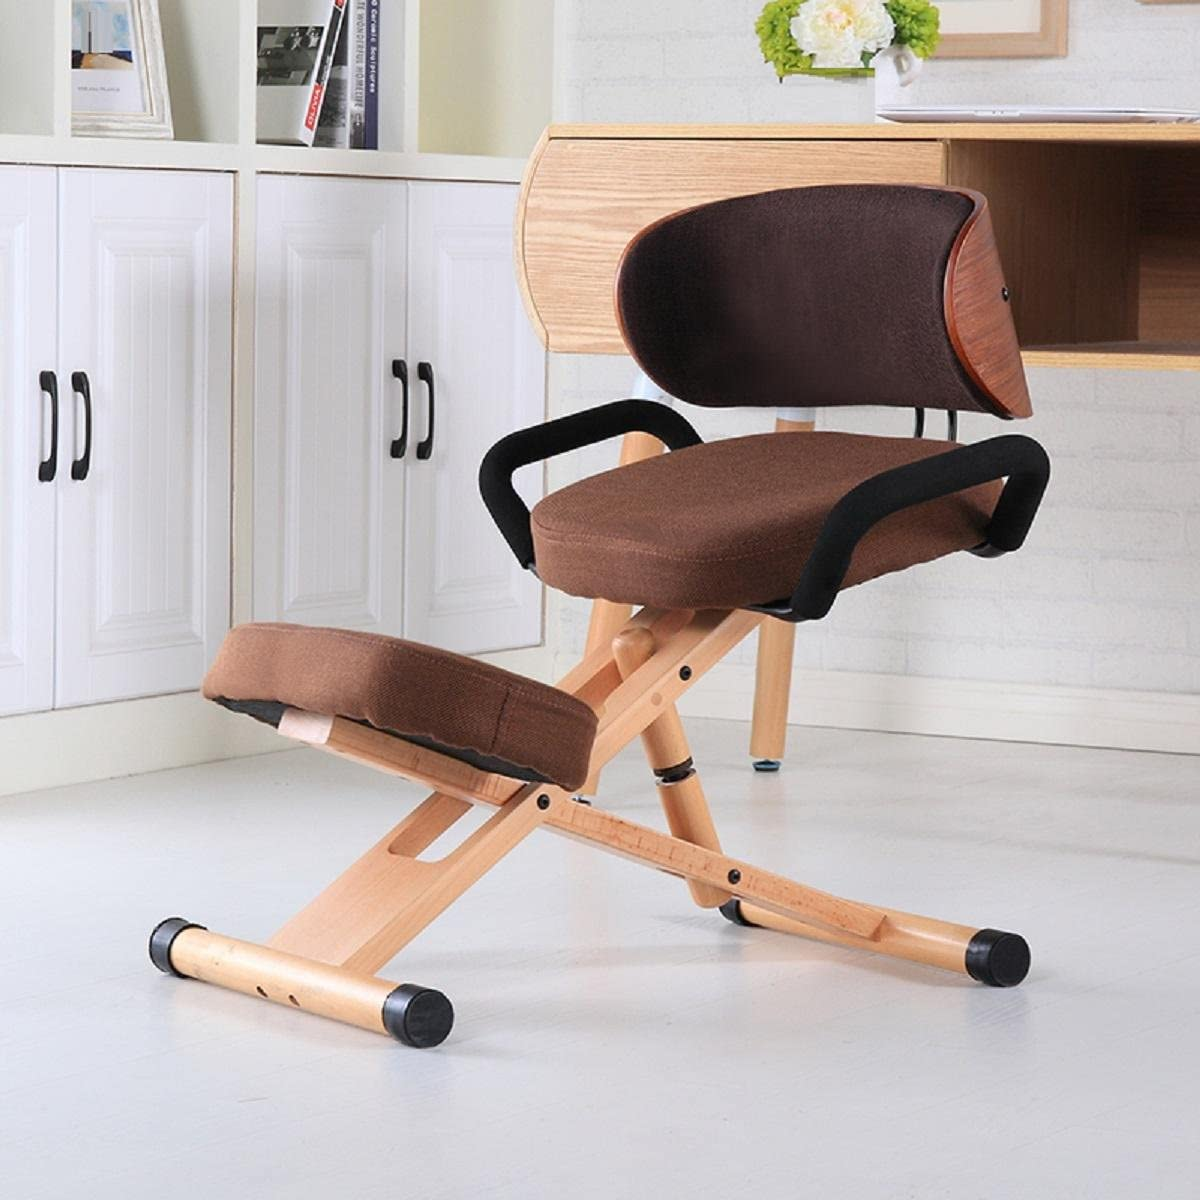 Botón a silla de rodillas Gaojian